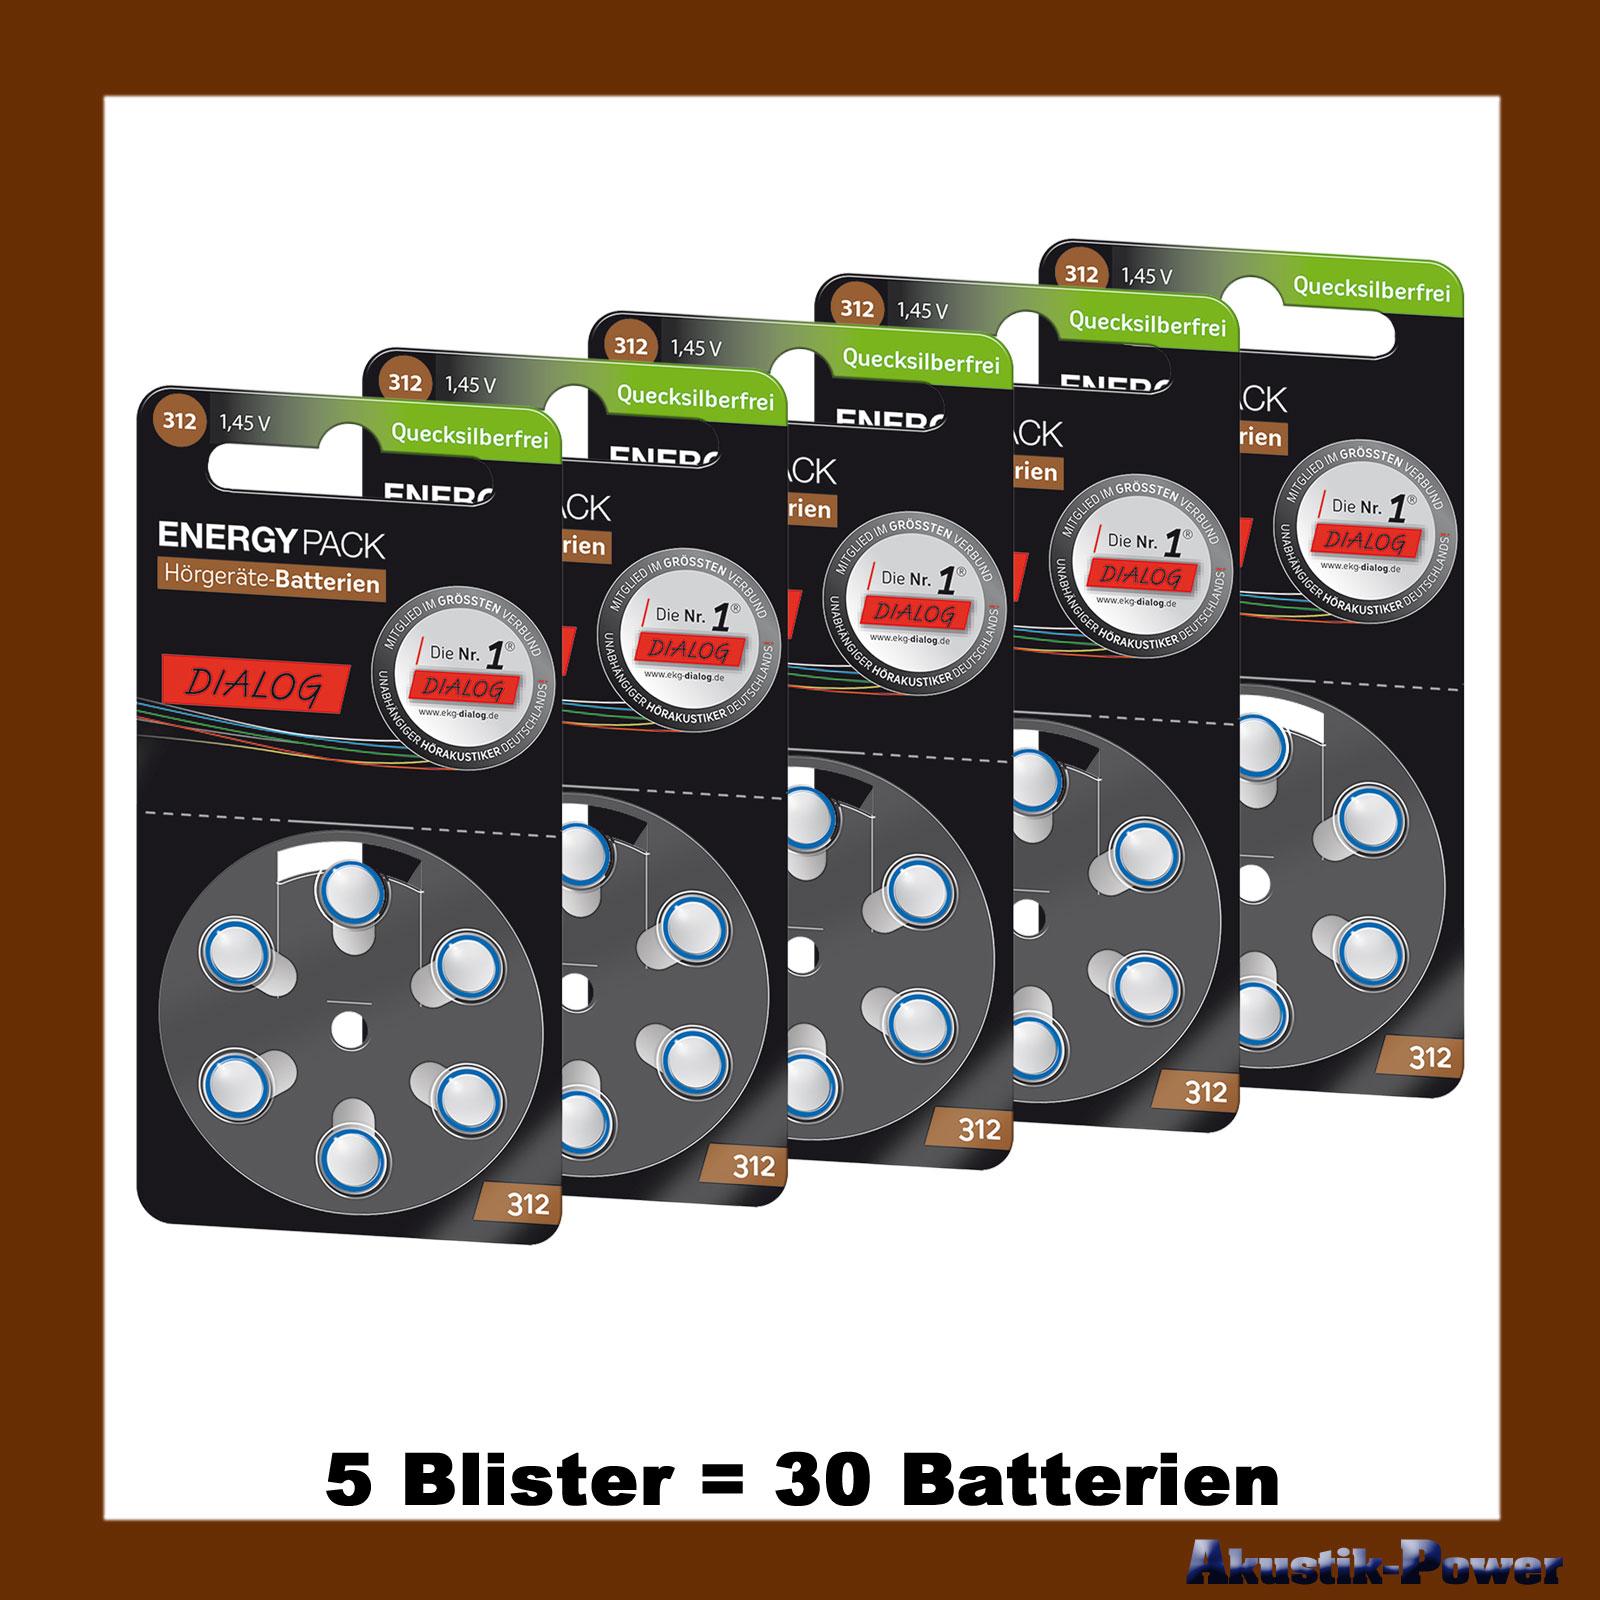 akustik power energy pack typ 312 pr41 a312 h rger te batterien 30 batterien 11 99. Black Bedroom Furniture Sets. Home Design Ideas